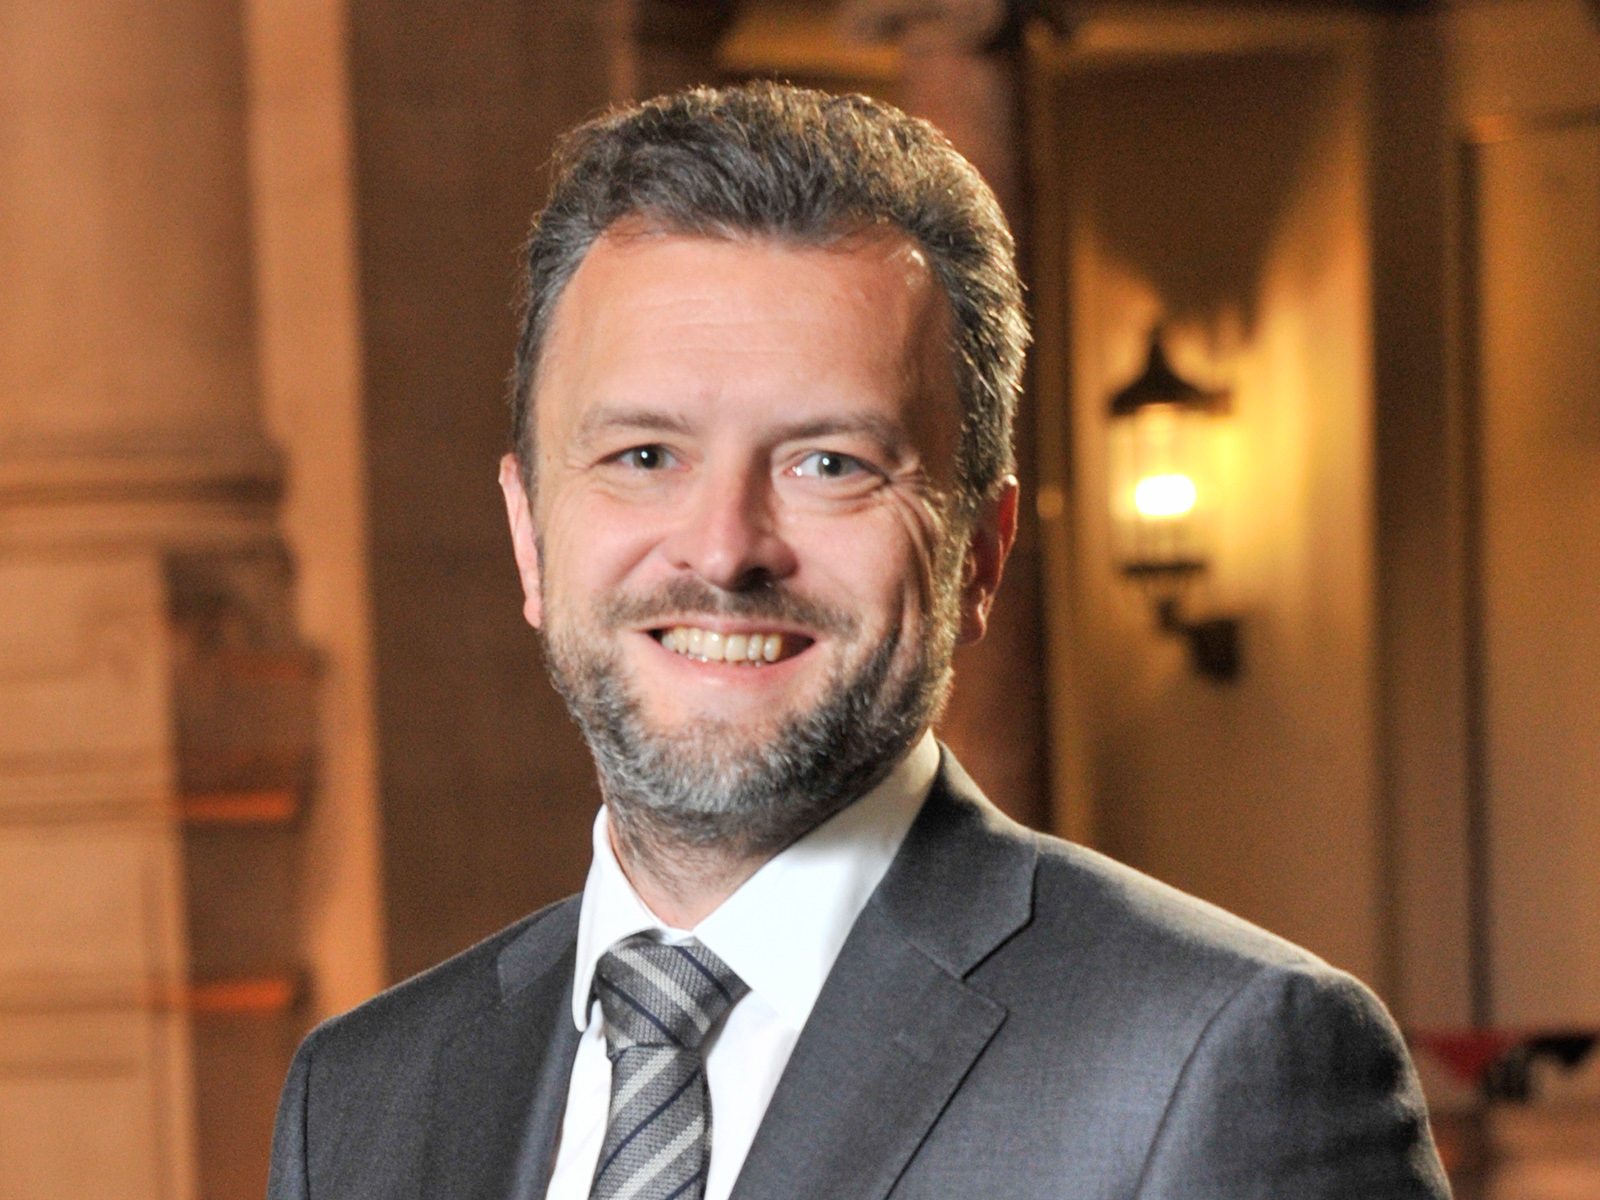 Jens-Michael Emmelmann